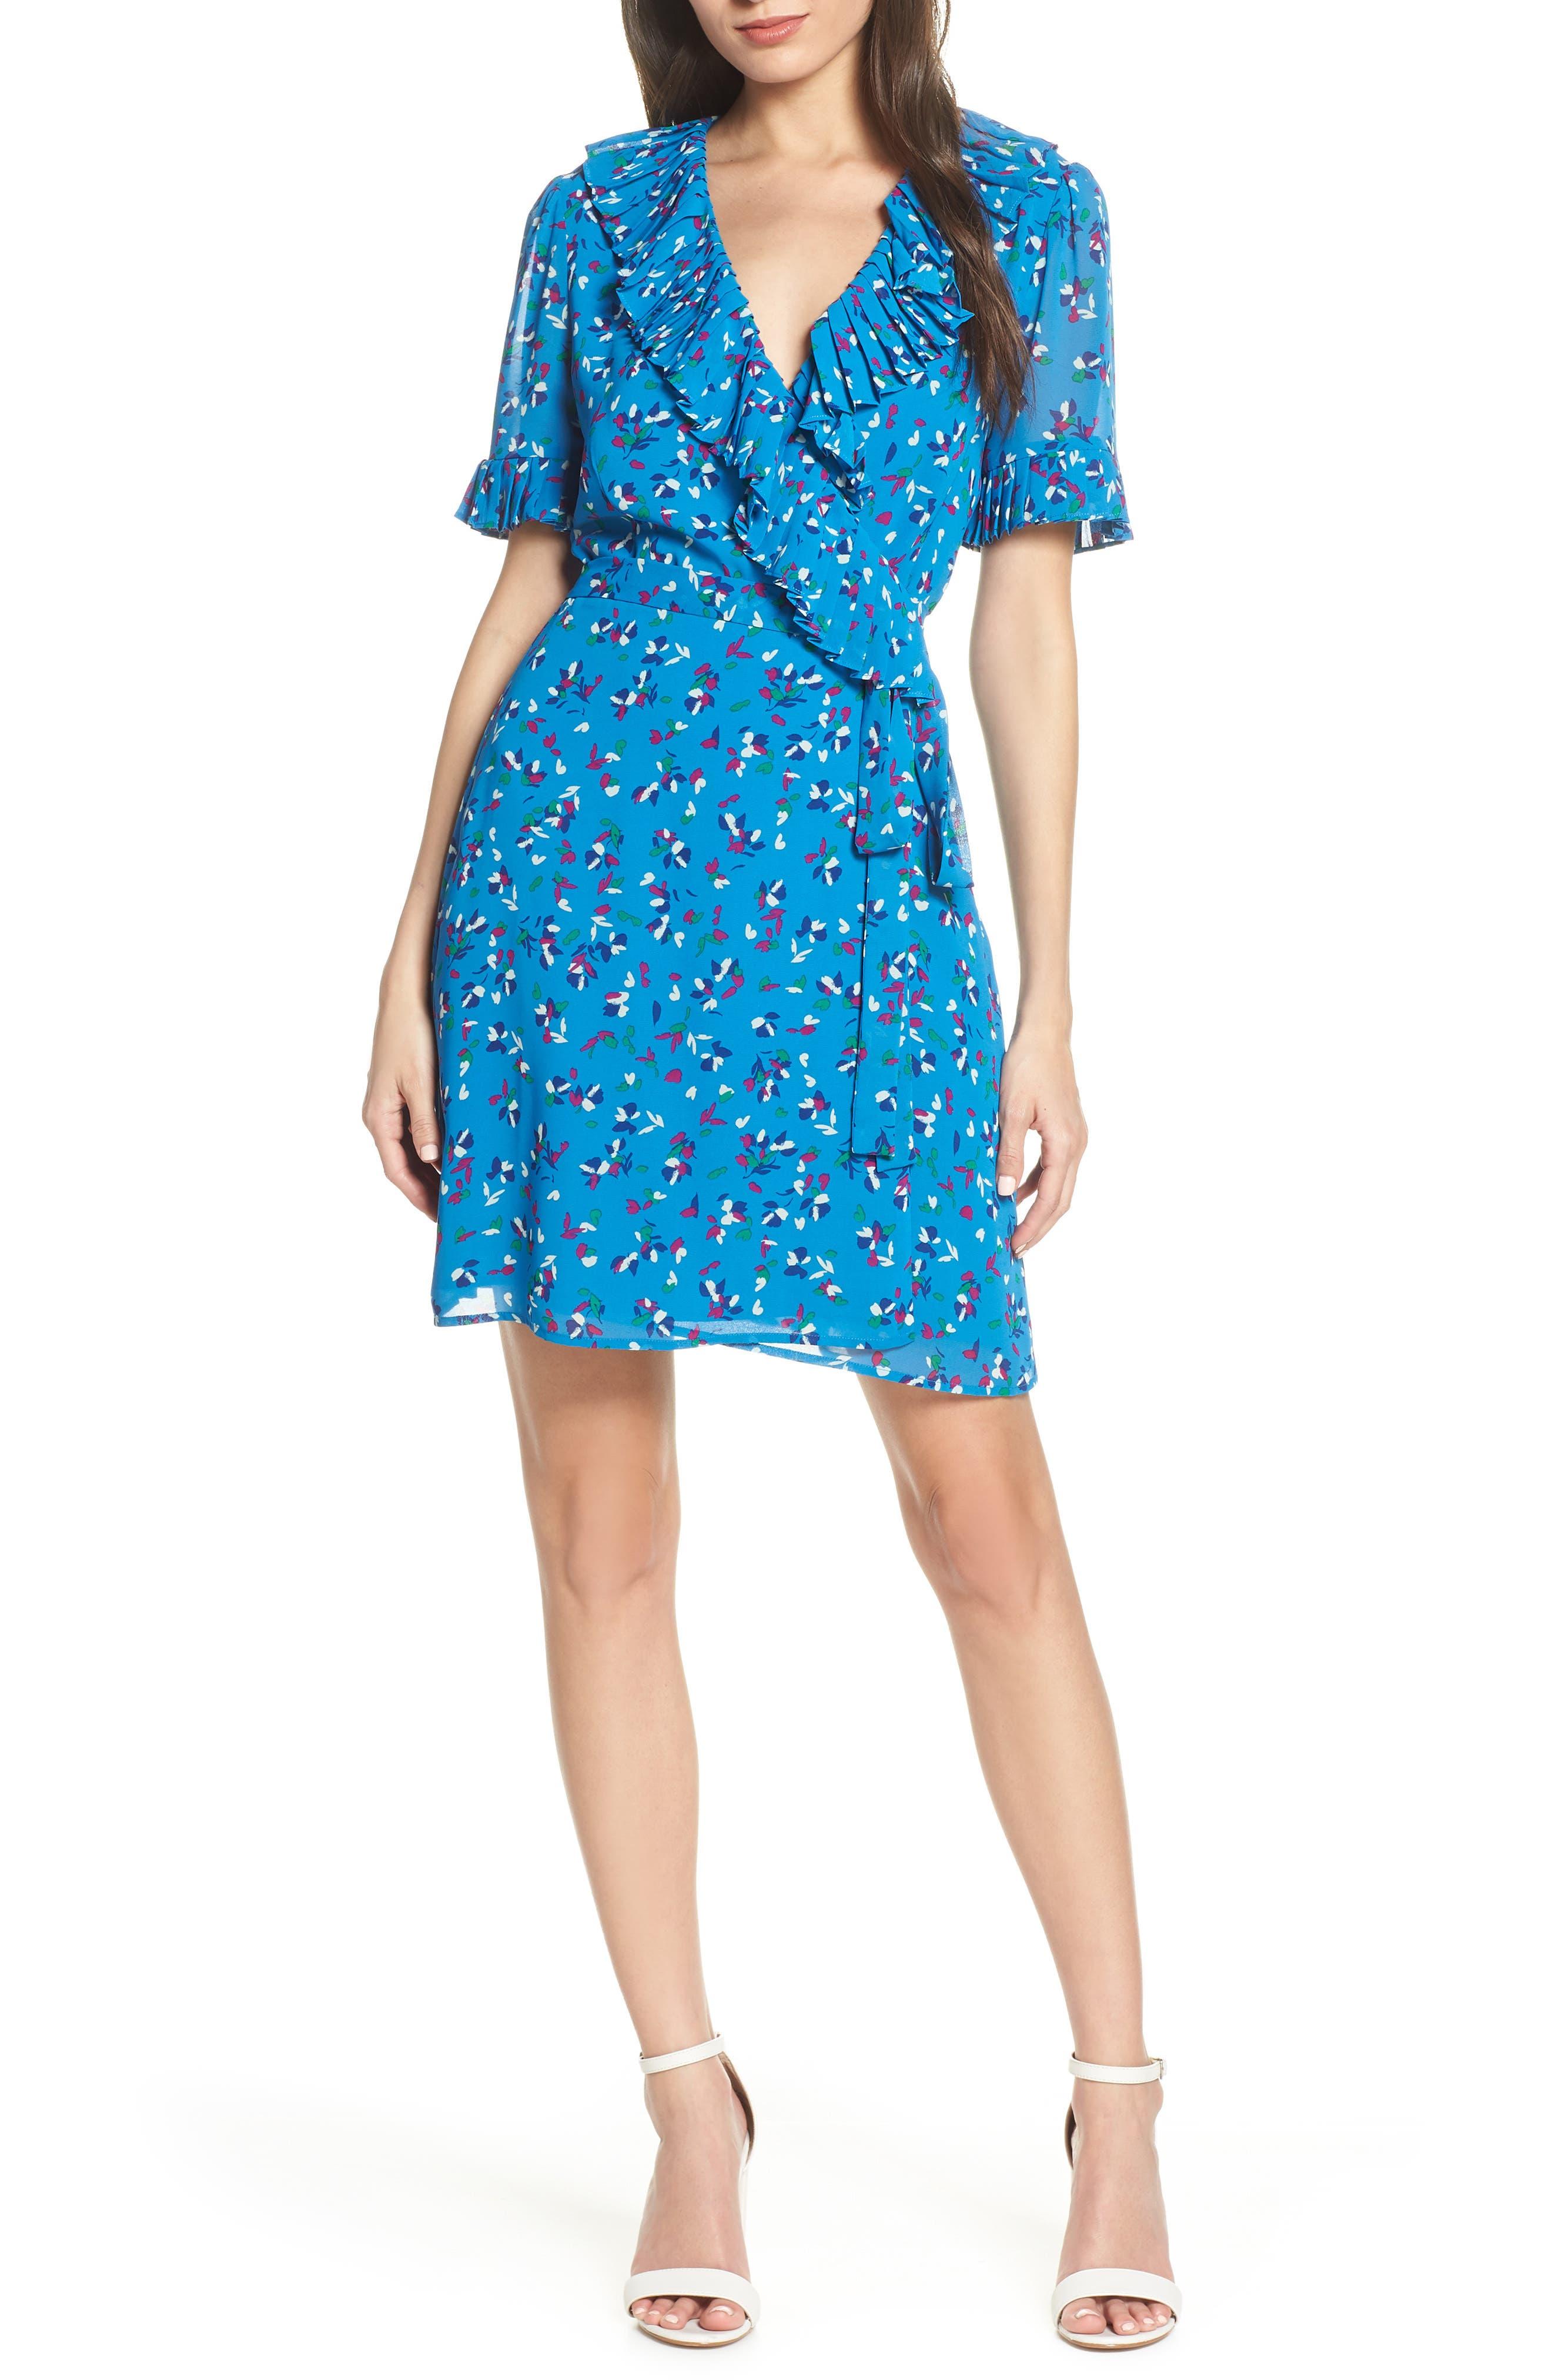 CHARLES HENRY, Pleat Neck Wrap Dress, Main thumbnail 1, color, BLUE FLORAL DITZY